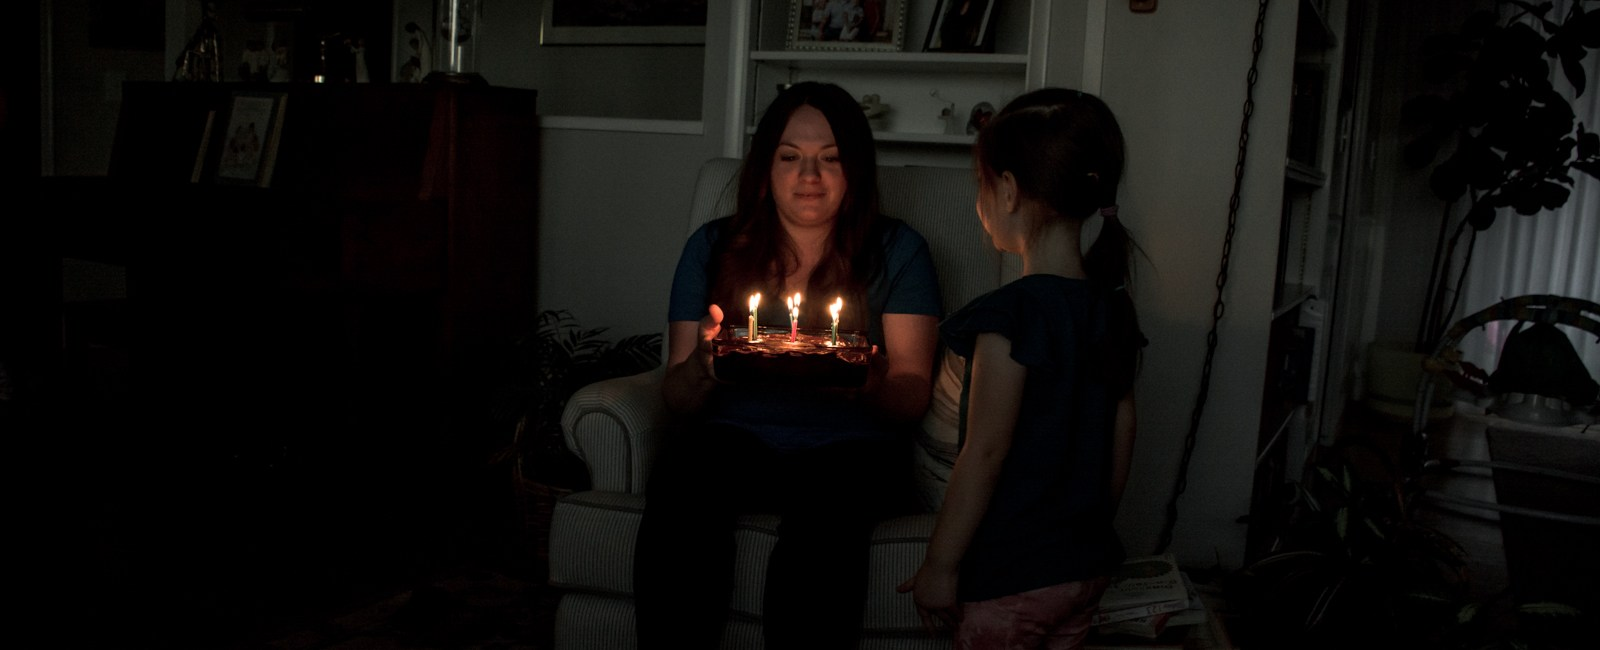 34th birthday